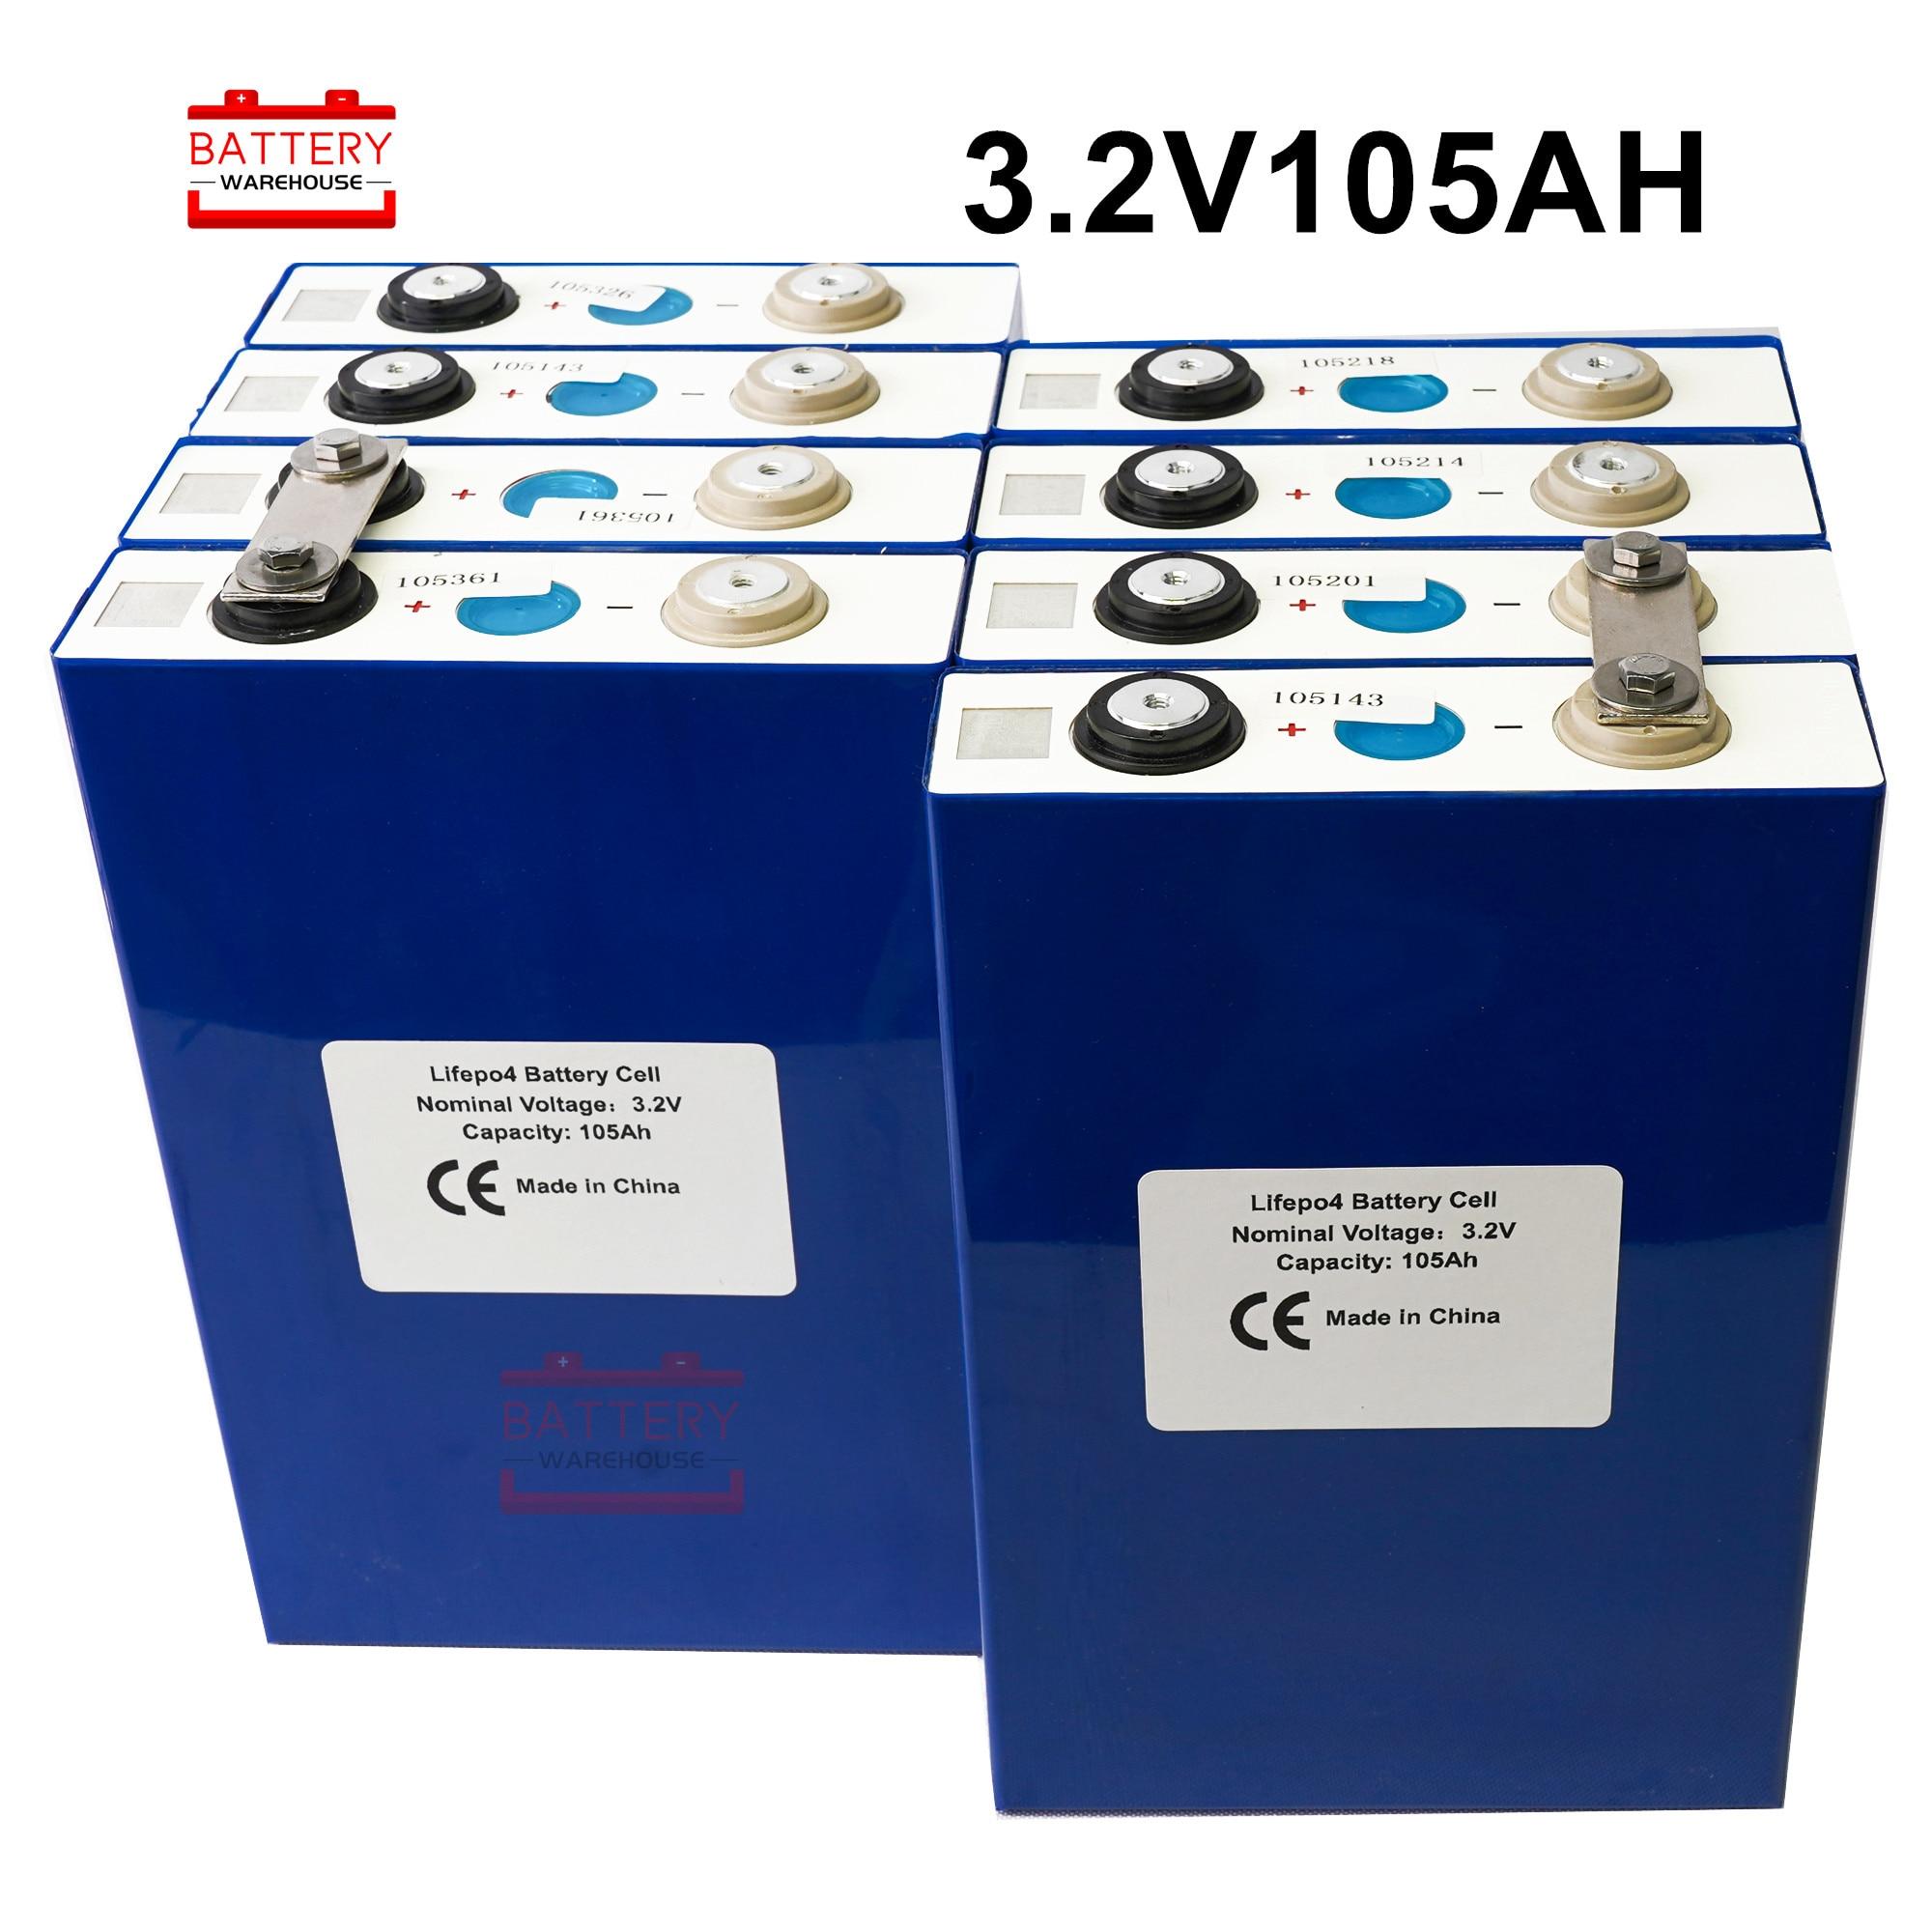 8 pièces 3.2v lifepo4 batterie 3.2v100Ah 105Ah lithium batterie nouveau magasin promotion for12V 24V stockage d'énergie solaire RV sans taxe